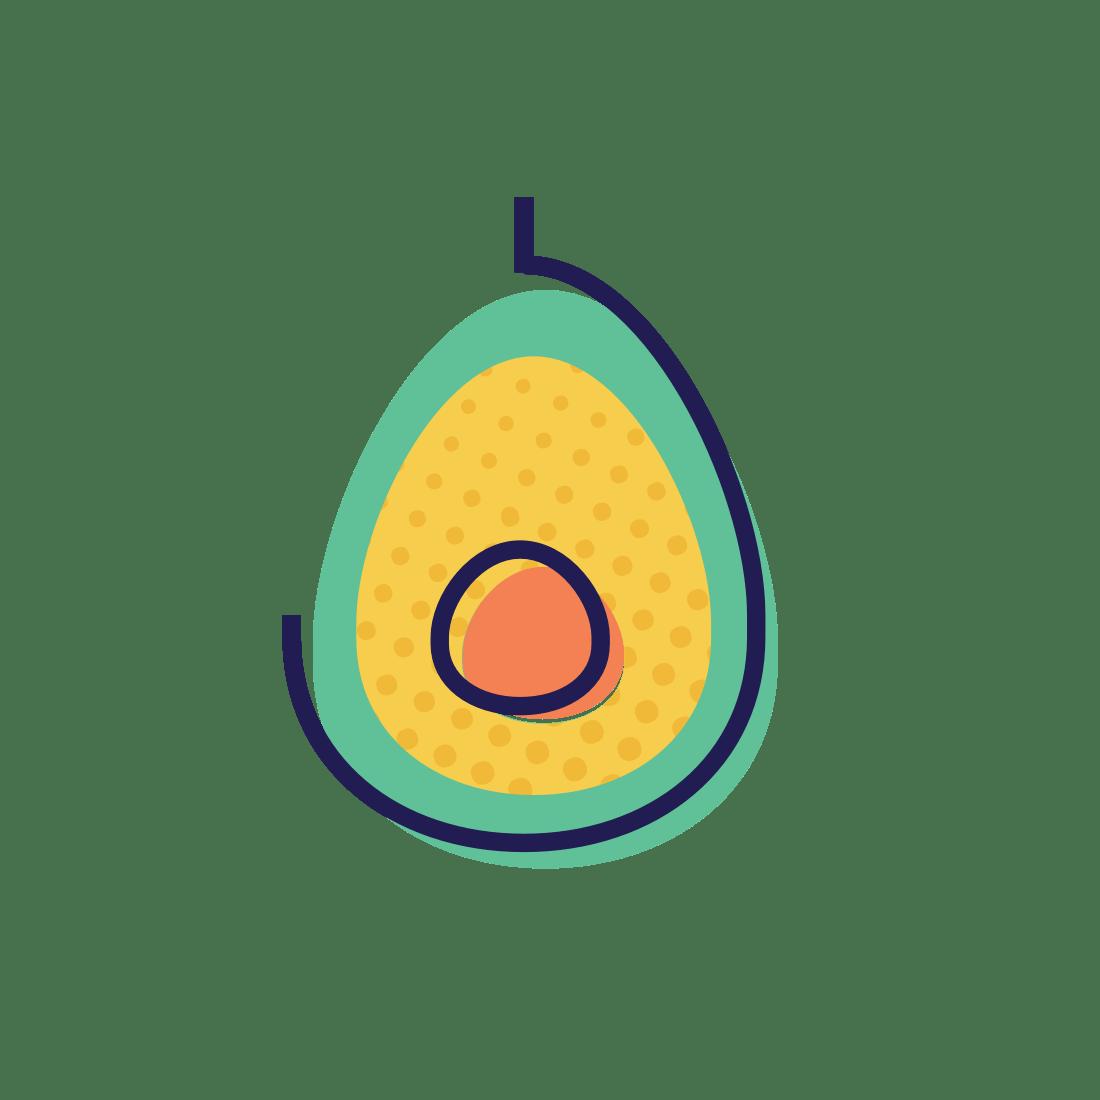 hight resolution of avocado